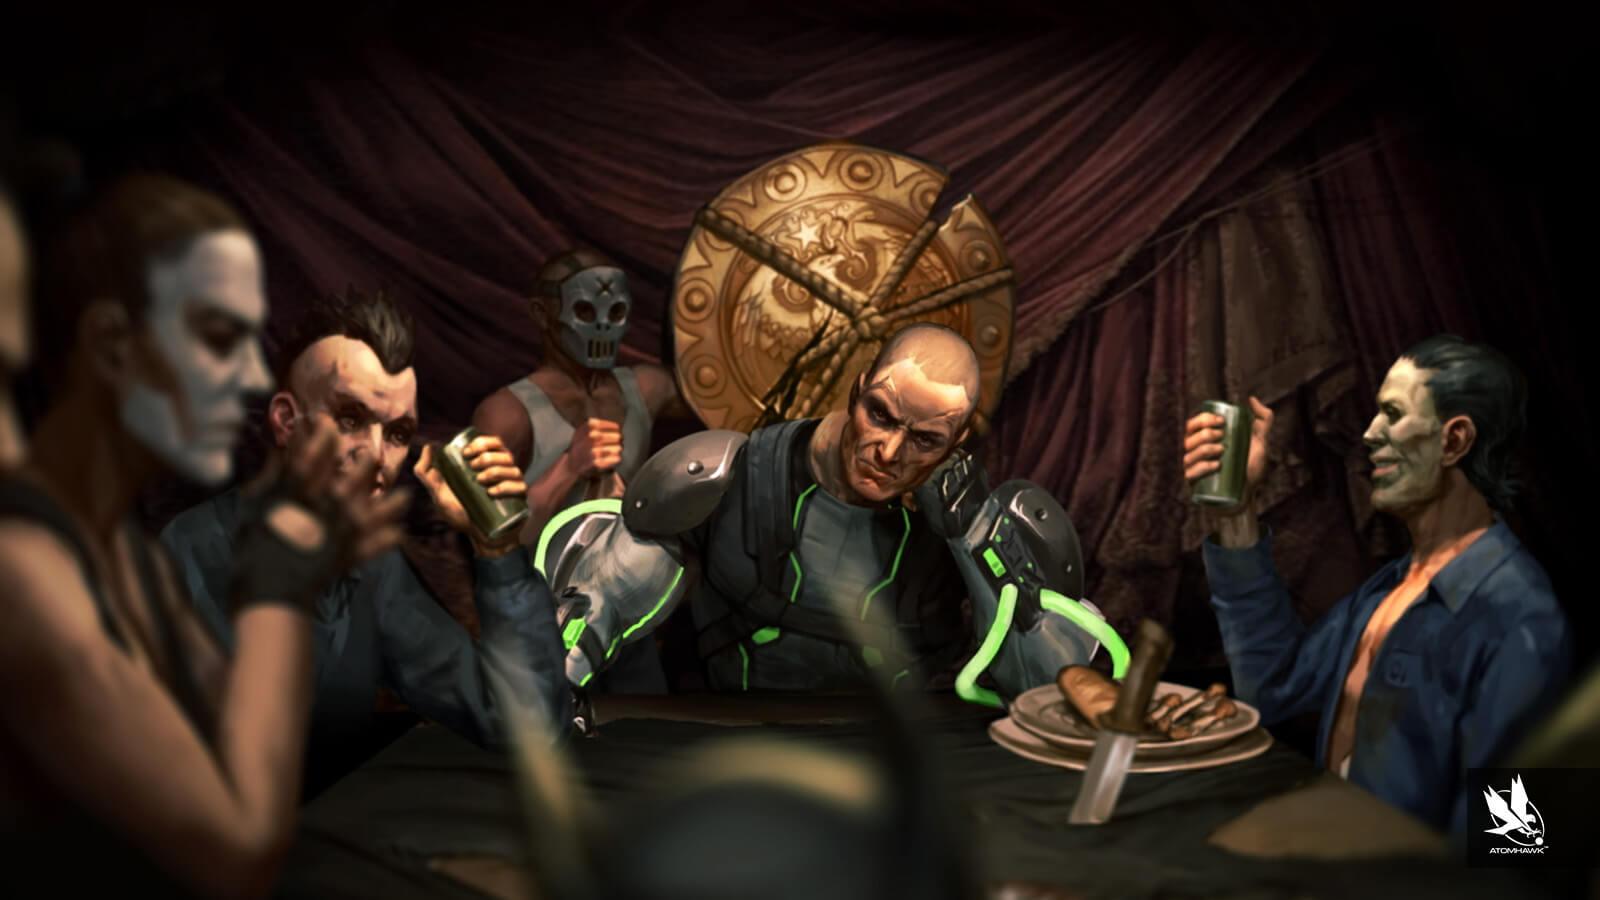 Atomhawk_Warner-Bros-NetherRealm_Injustice-2_Motion-Graphics_Character-Endings_Bane1.jpg